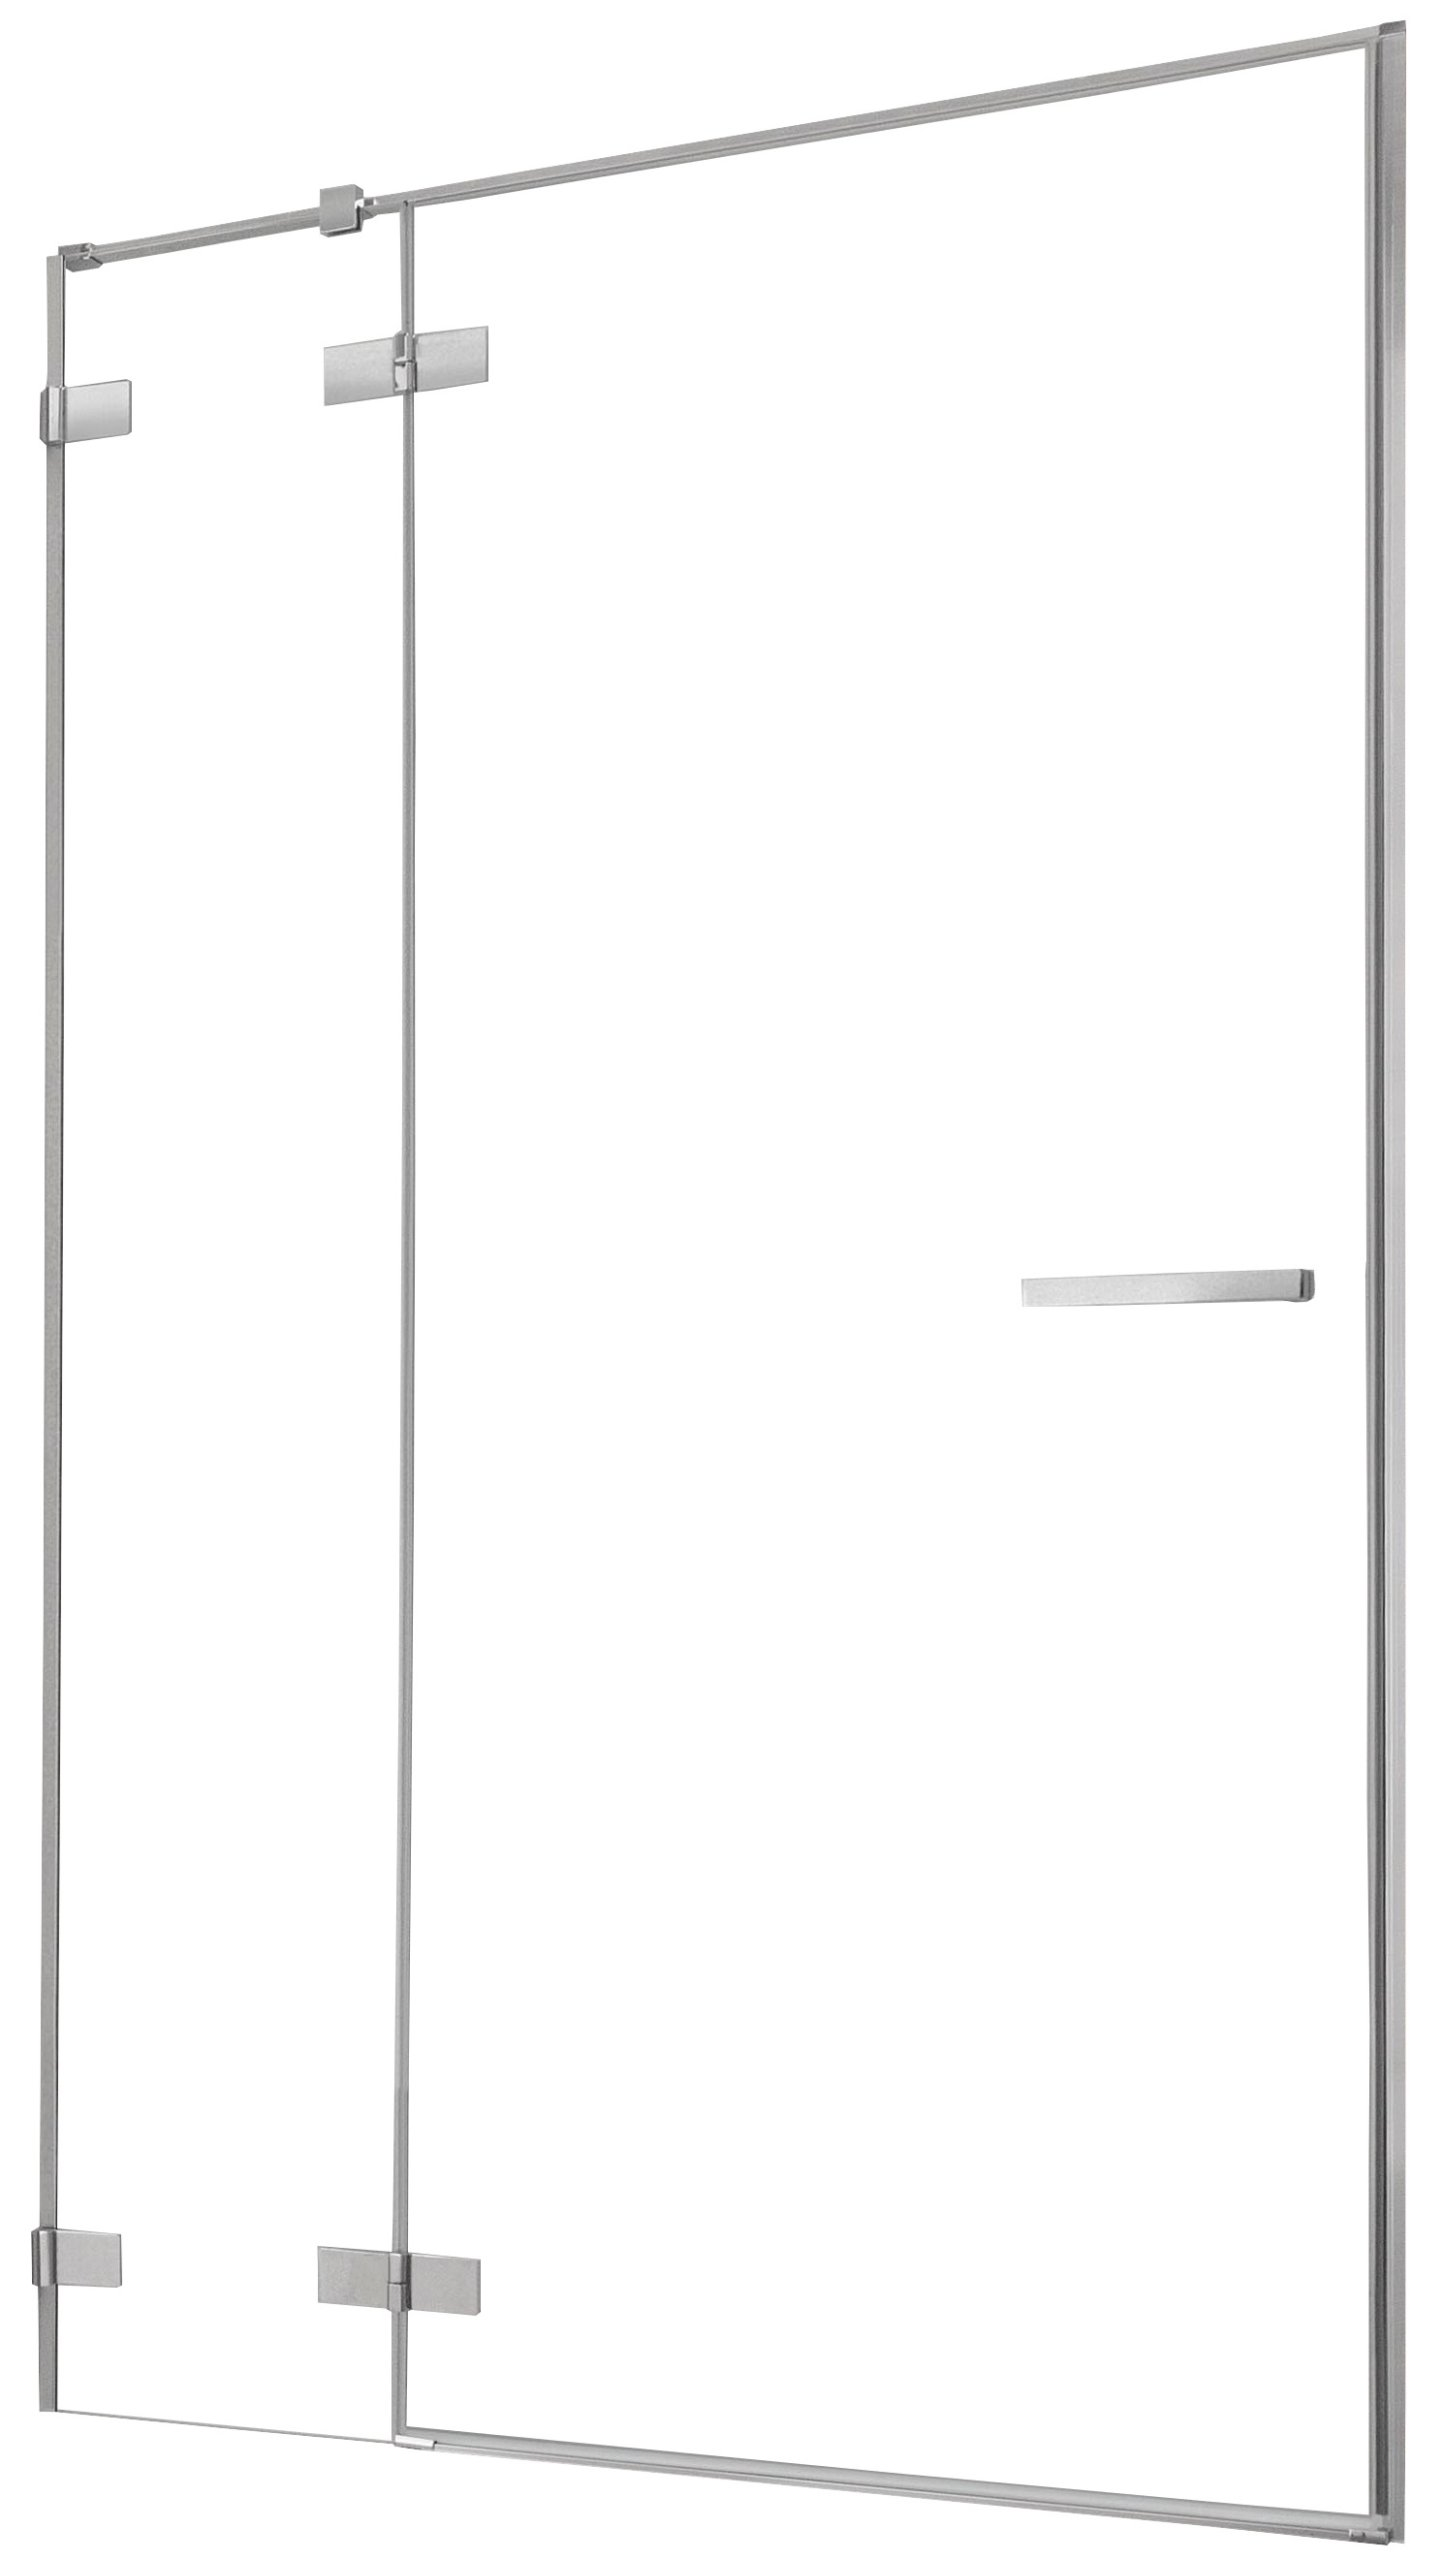 Sprchové dvere Euphoria DWJ RADAWAY 120x200